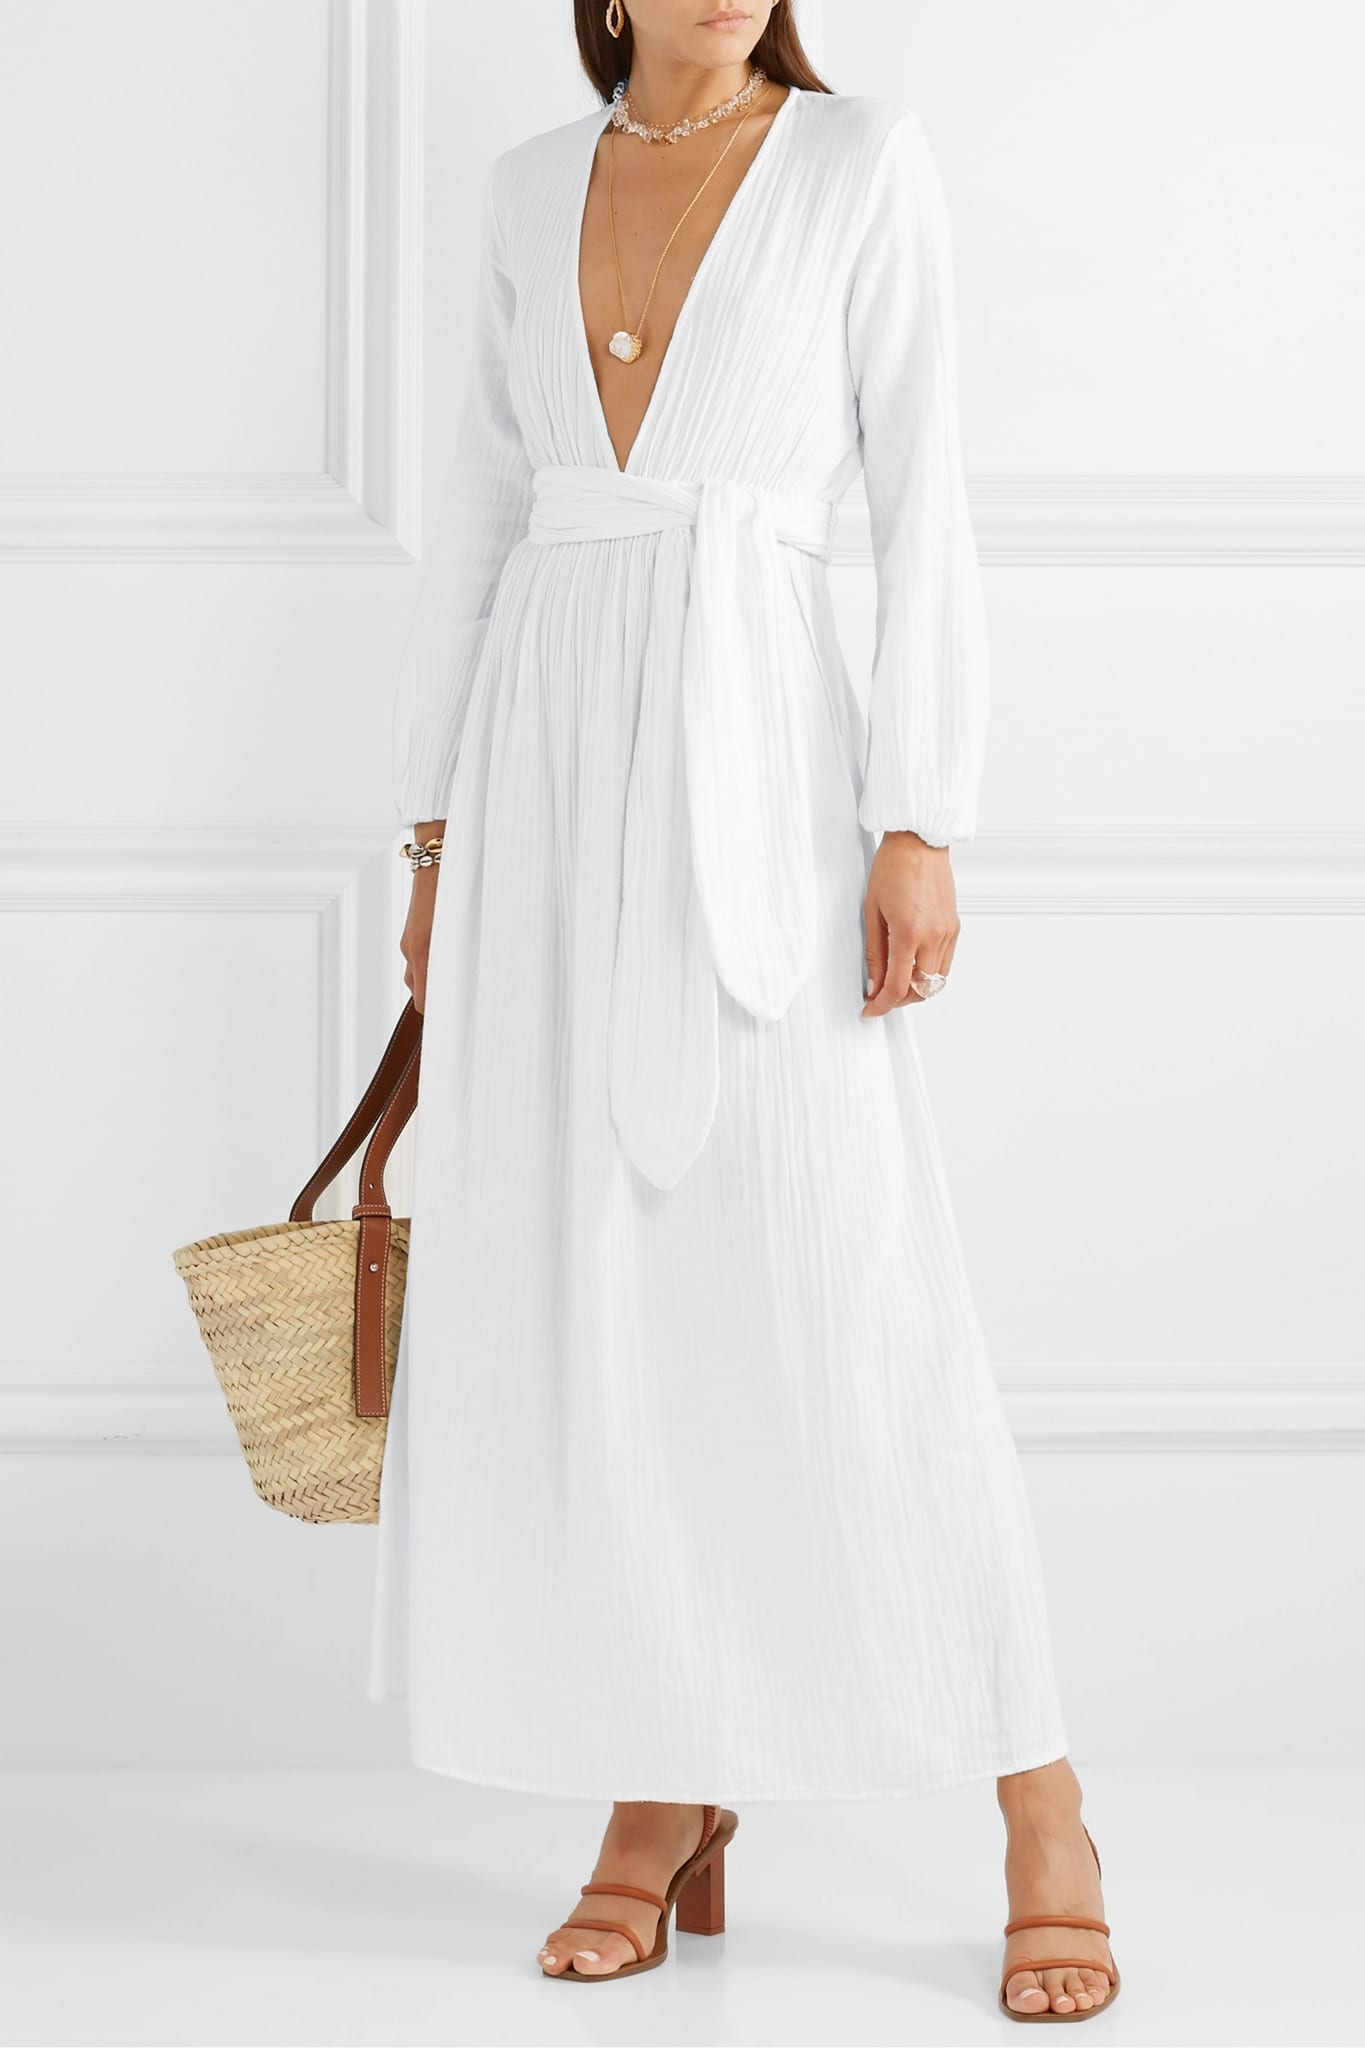 MARA HOFFMAN + NET SUSTAIN Luna Belted Crinkled Organic Cotton-gauze Maxi Dress